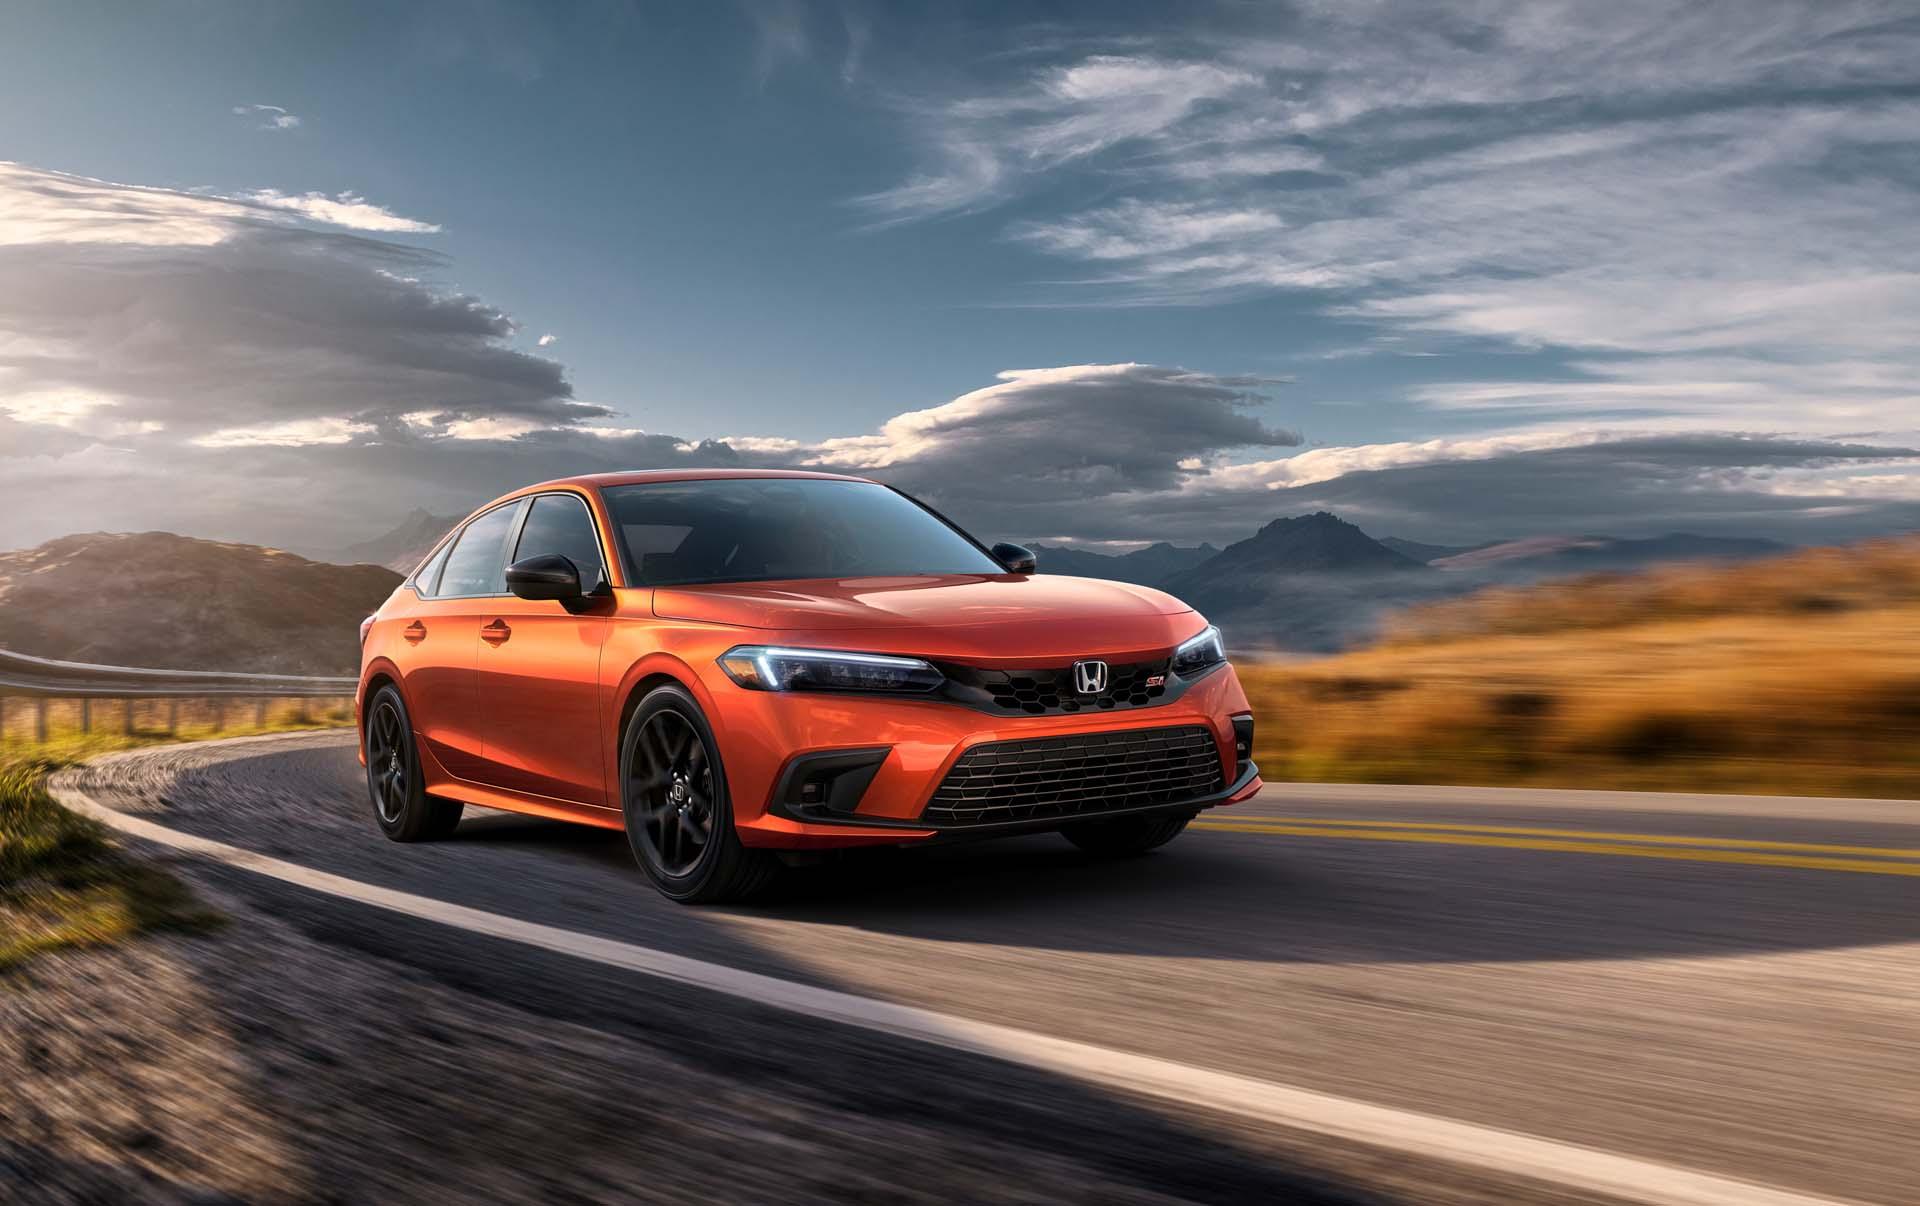 2022 Honda Civic Si, 2023 Chevy Corvette Z06, 2023 Land Rover Range Rover: This Week's Top Photos